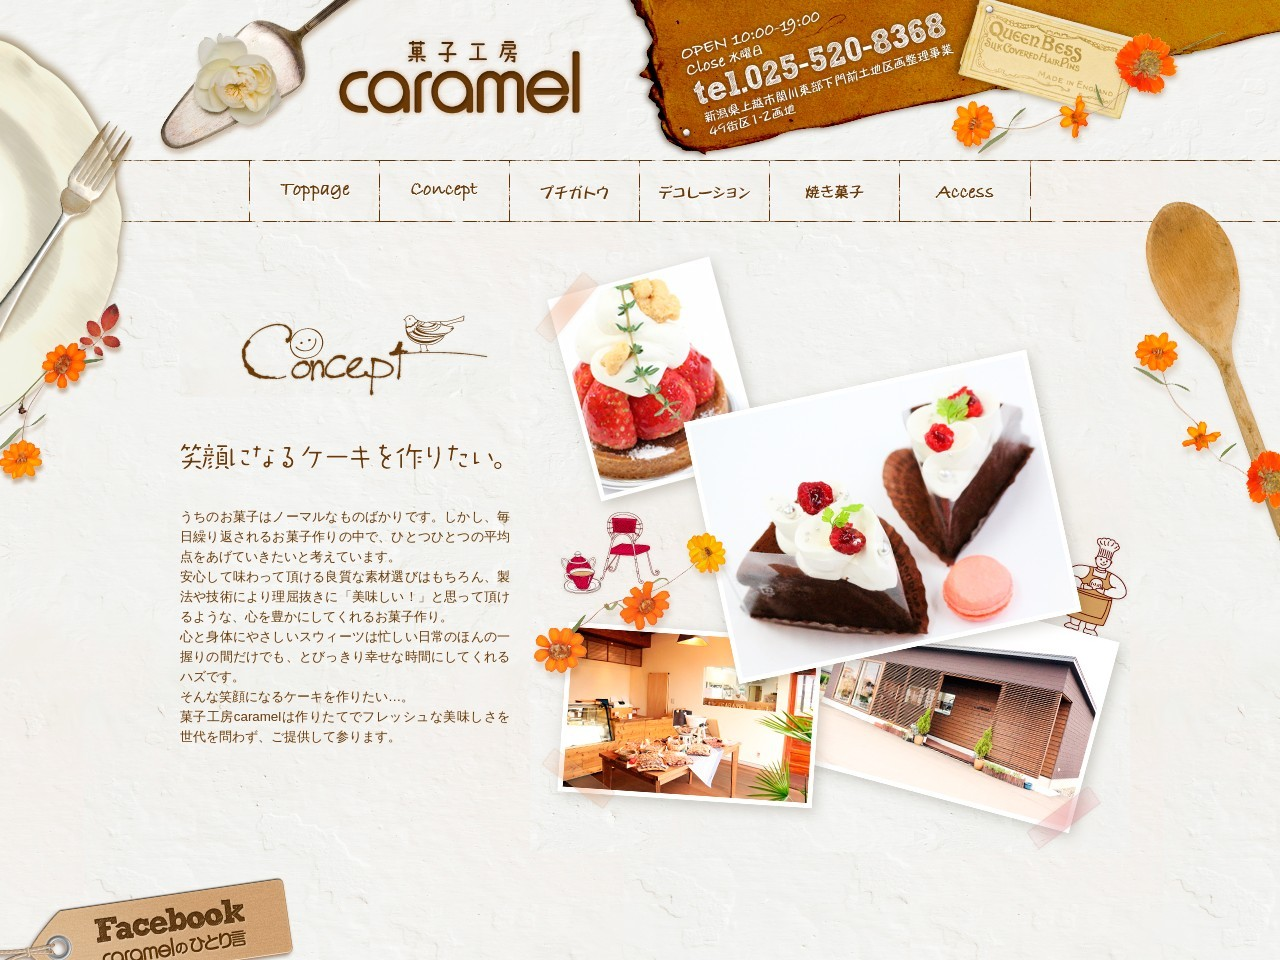 菓子工房Caramel